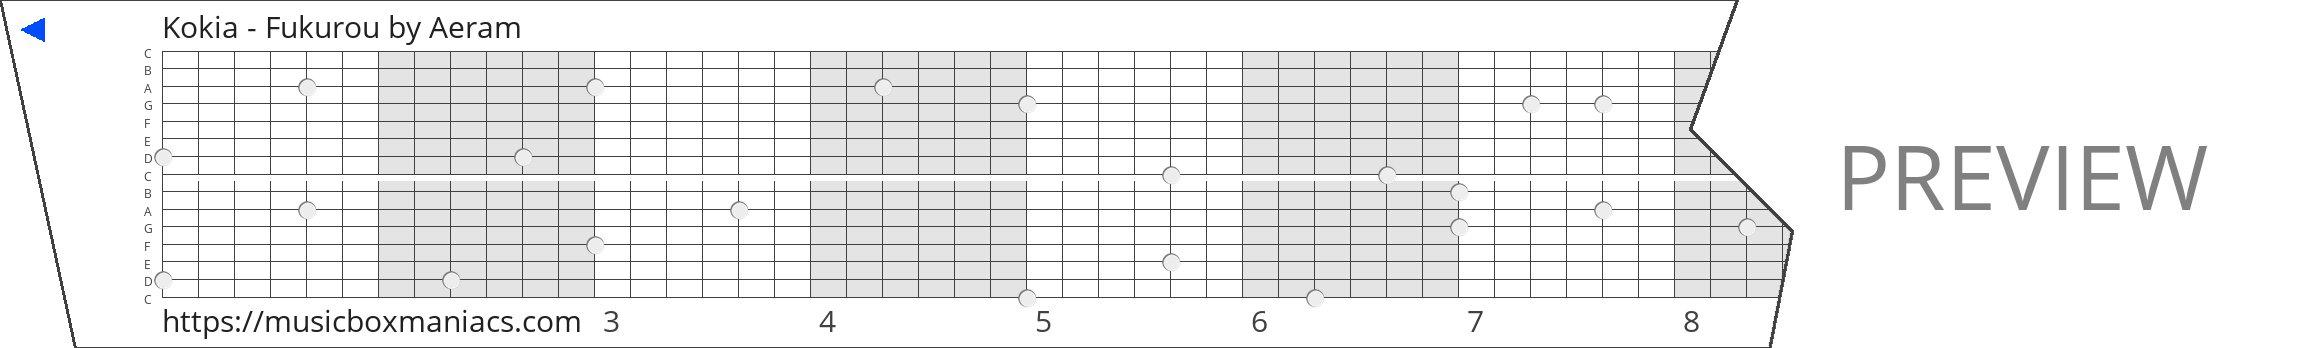 Kokia - Fukurou 15 note music box paper strip